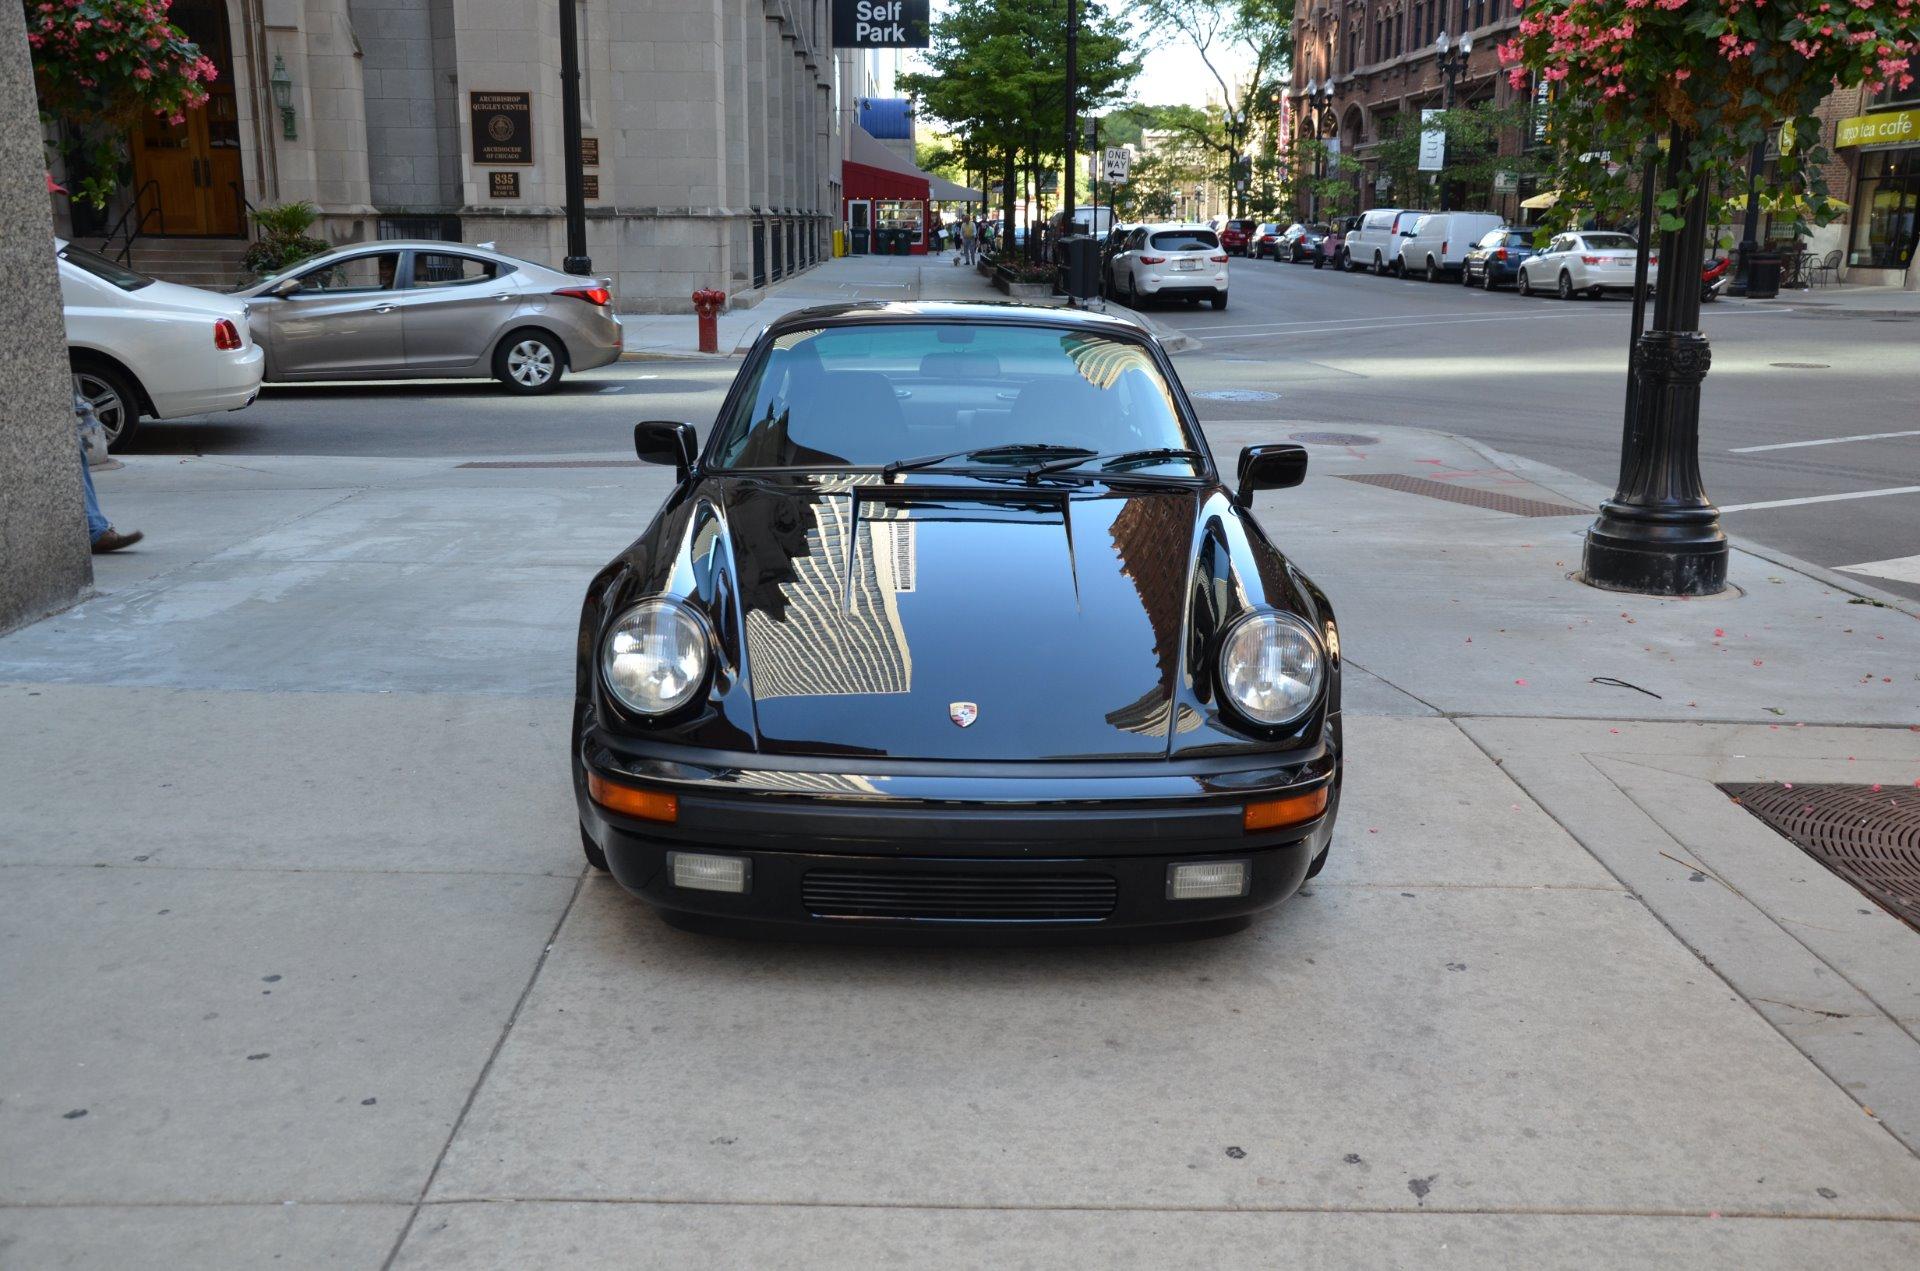 1986 porsche 911 carrera turbo stock gc chris51 for sale near chicago il il porsche dealer. Black Bedroom Furniture Sets. Home Design Ideas